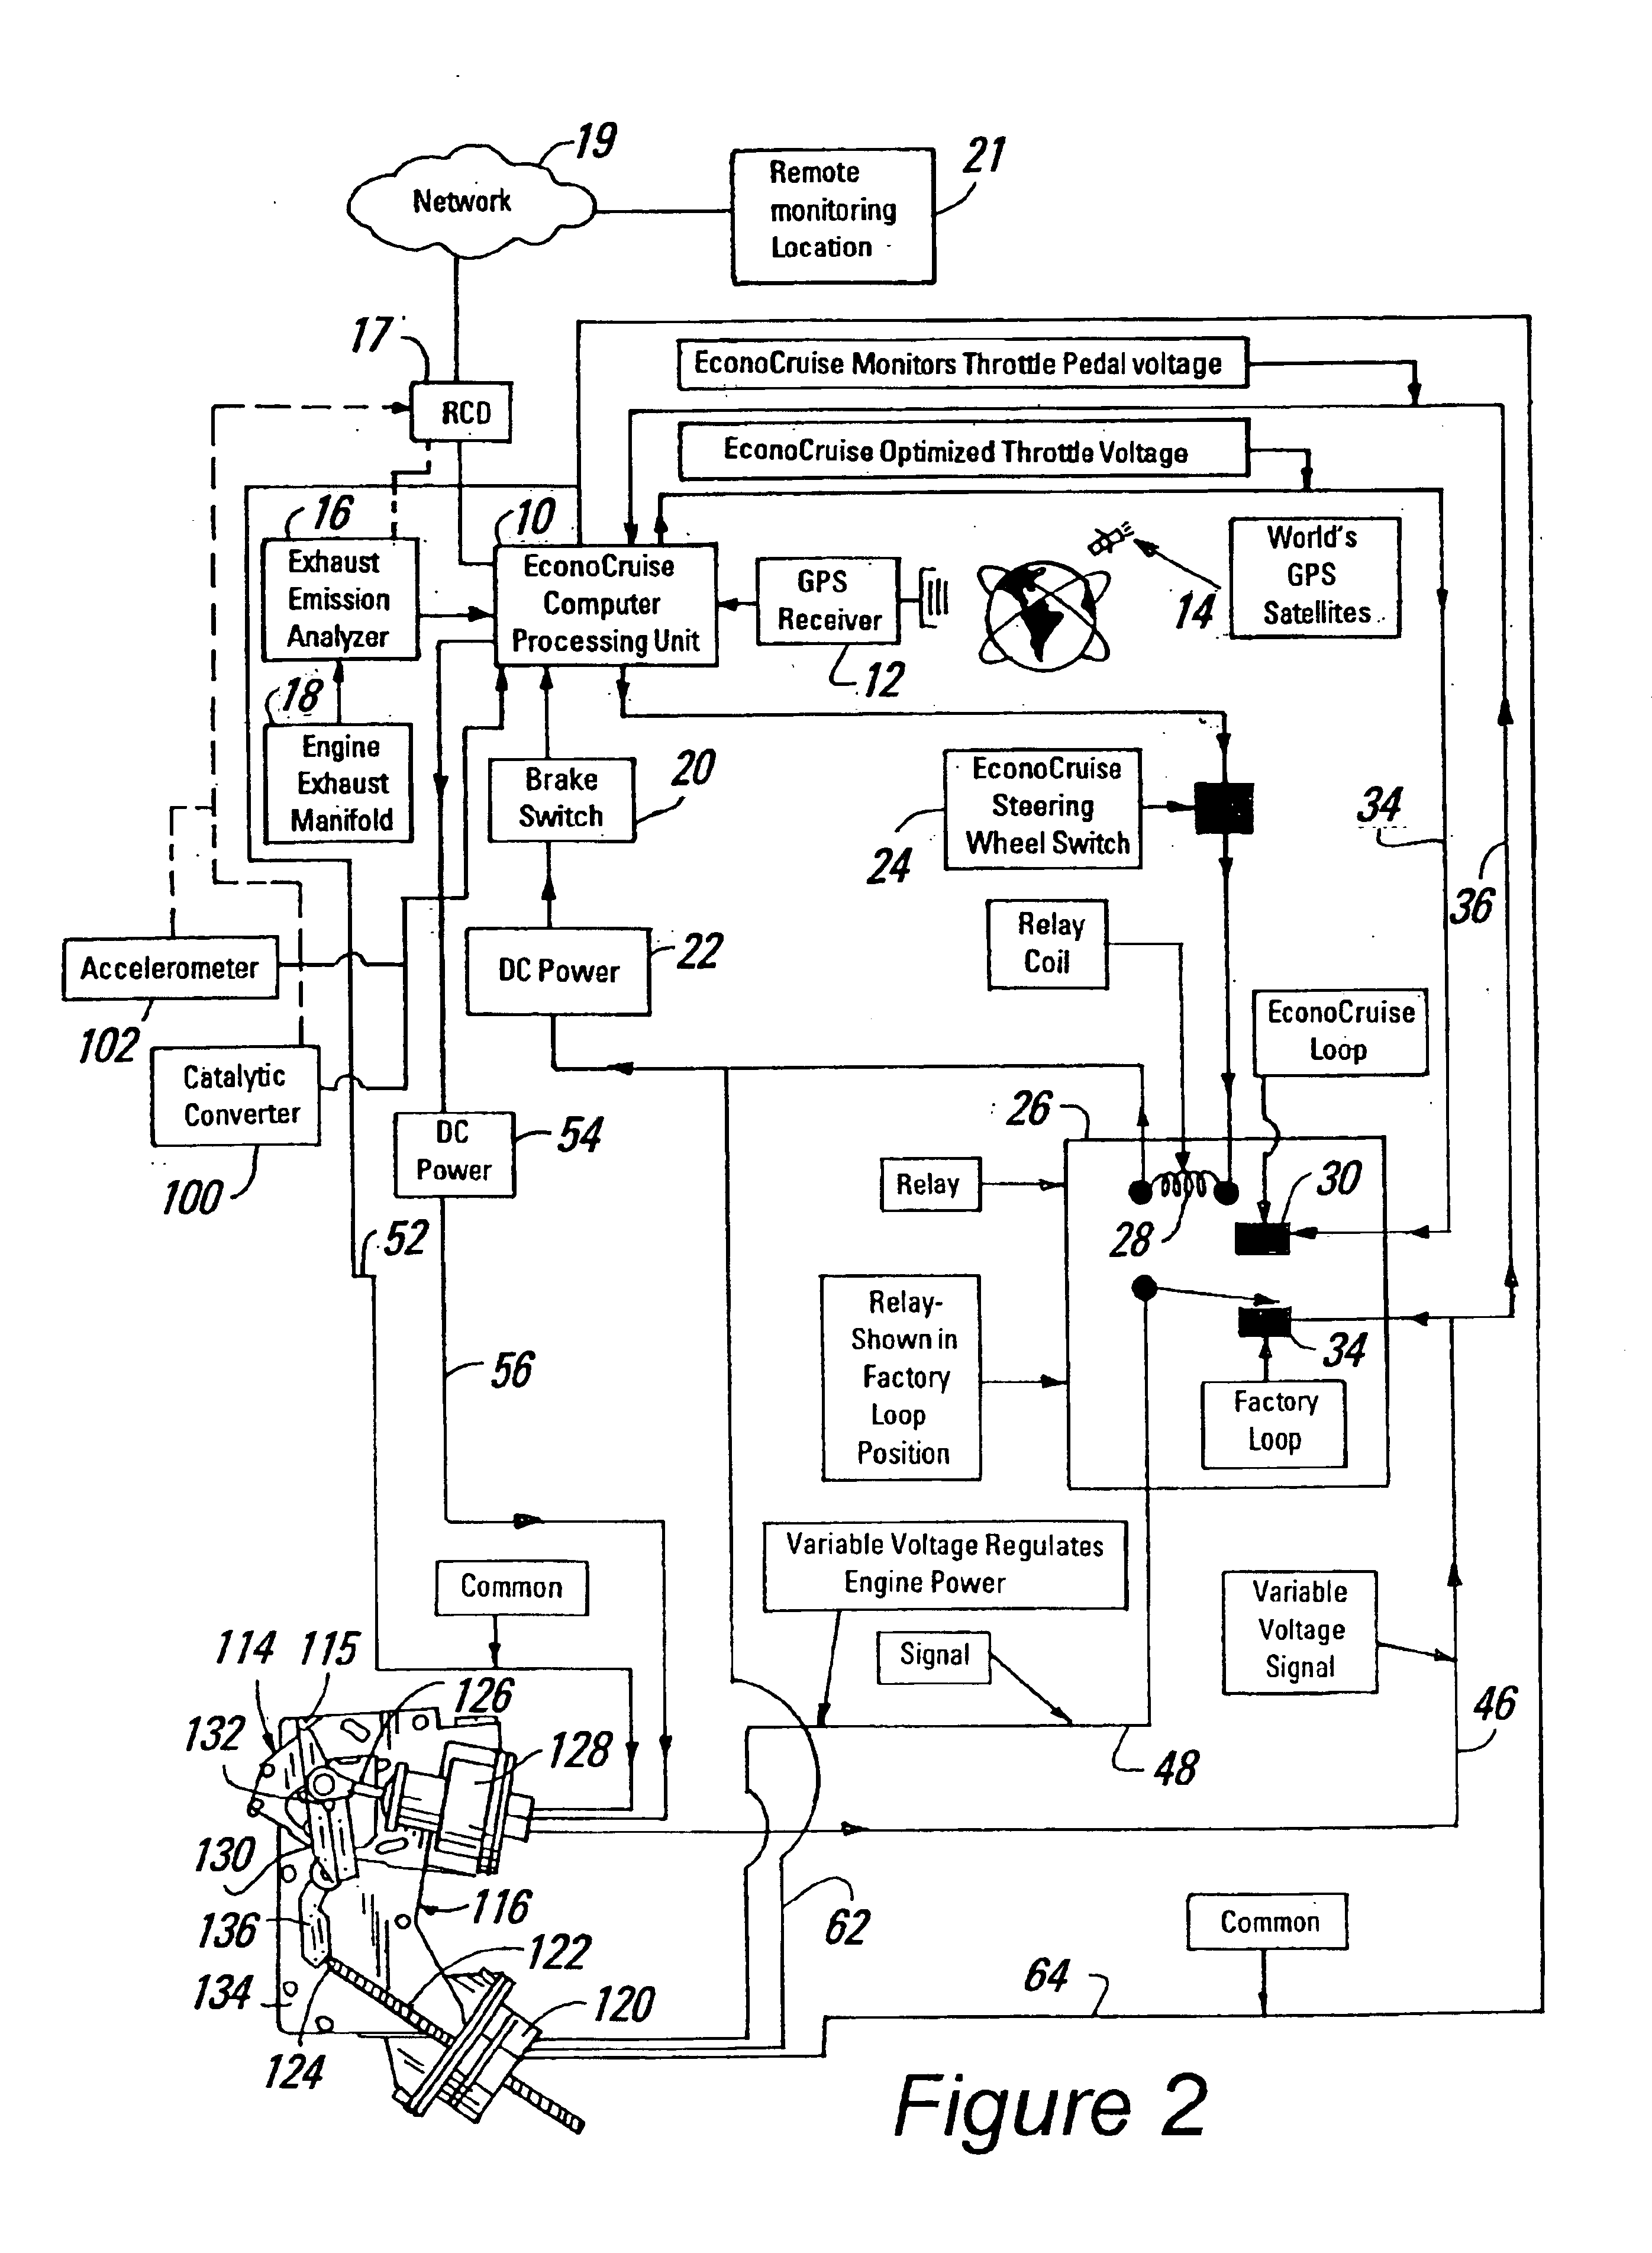 Swell Diagram Besides International 424 Tractor Manual On Ih 424 Wiring Wiring Cloud Filiciilluminateatxorg